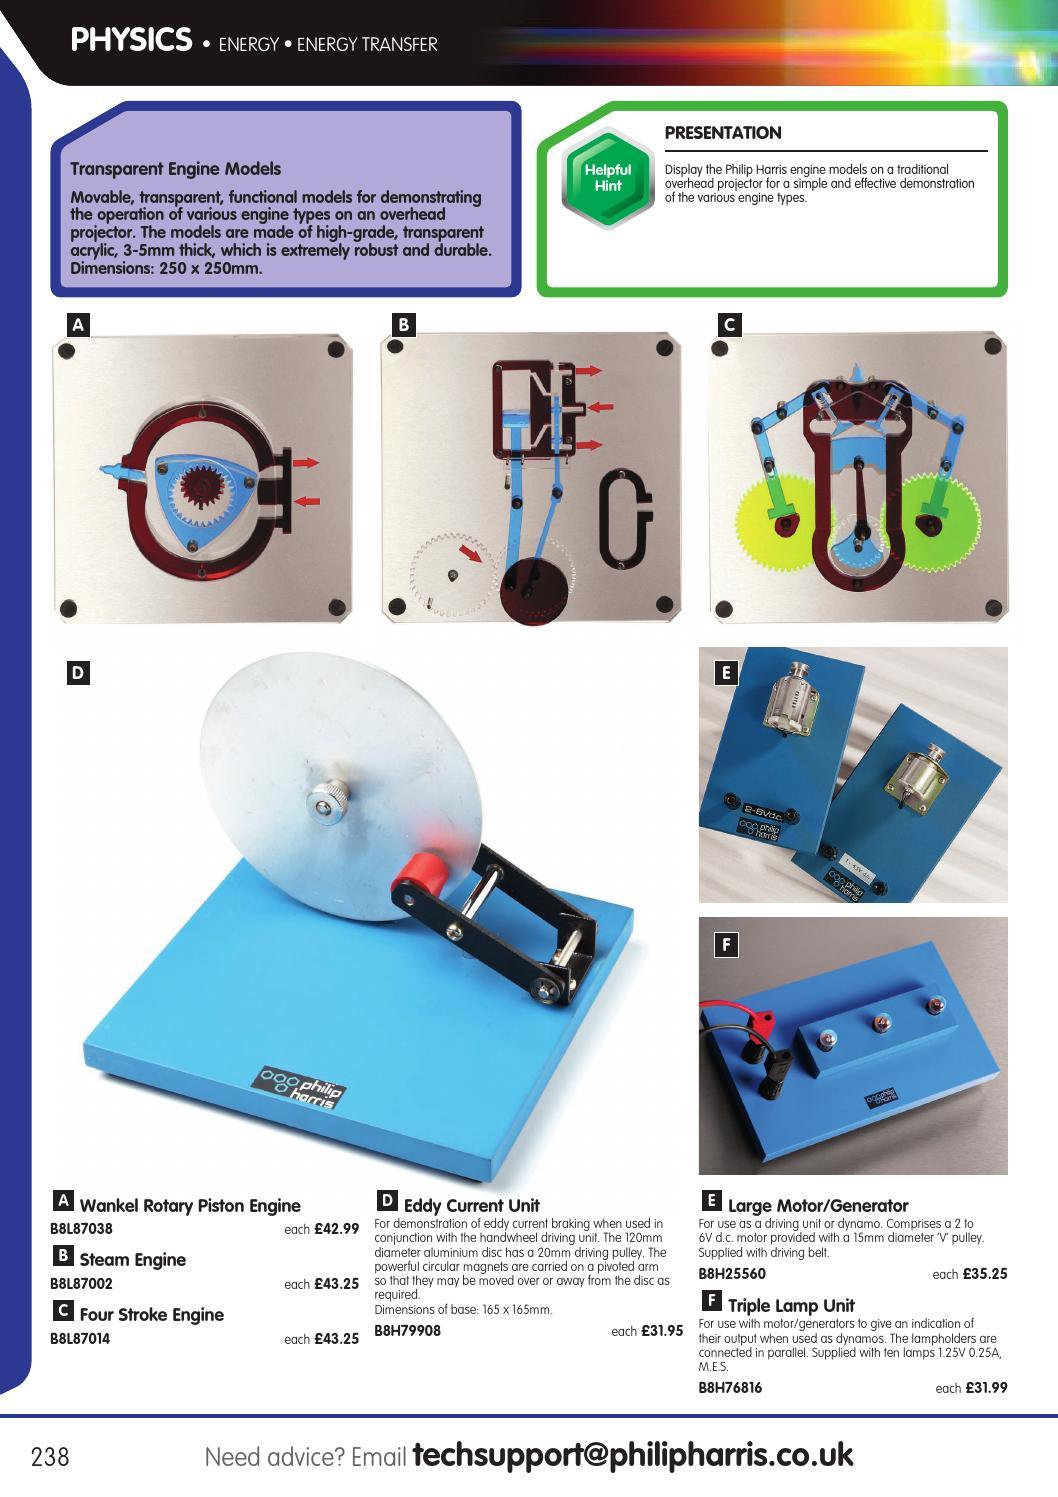 Philip Harris Catalogue 2015/16 - Physics by Findel Ltd - issuu